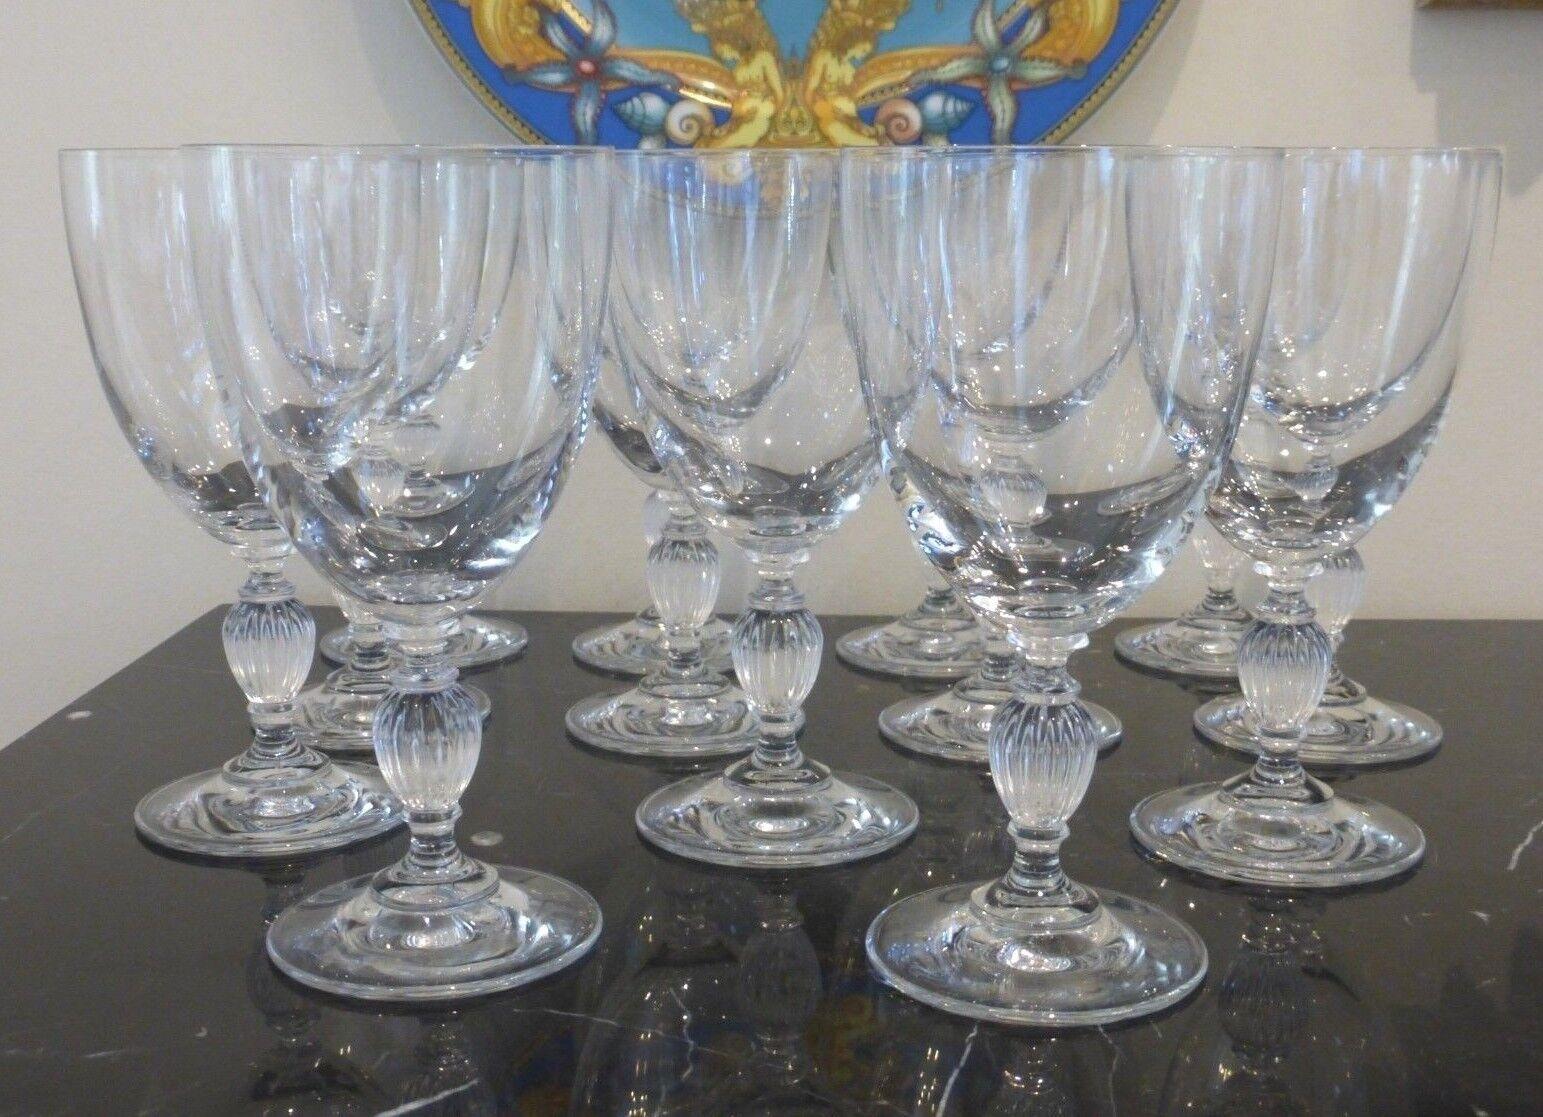 SPIEGELAU SET OF 13 WINNE GOBLET GLASSES 6 5 8  HIGH